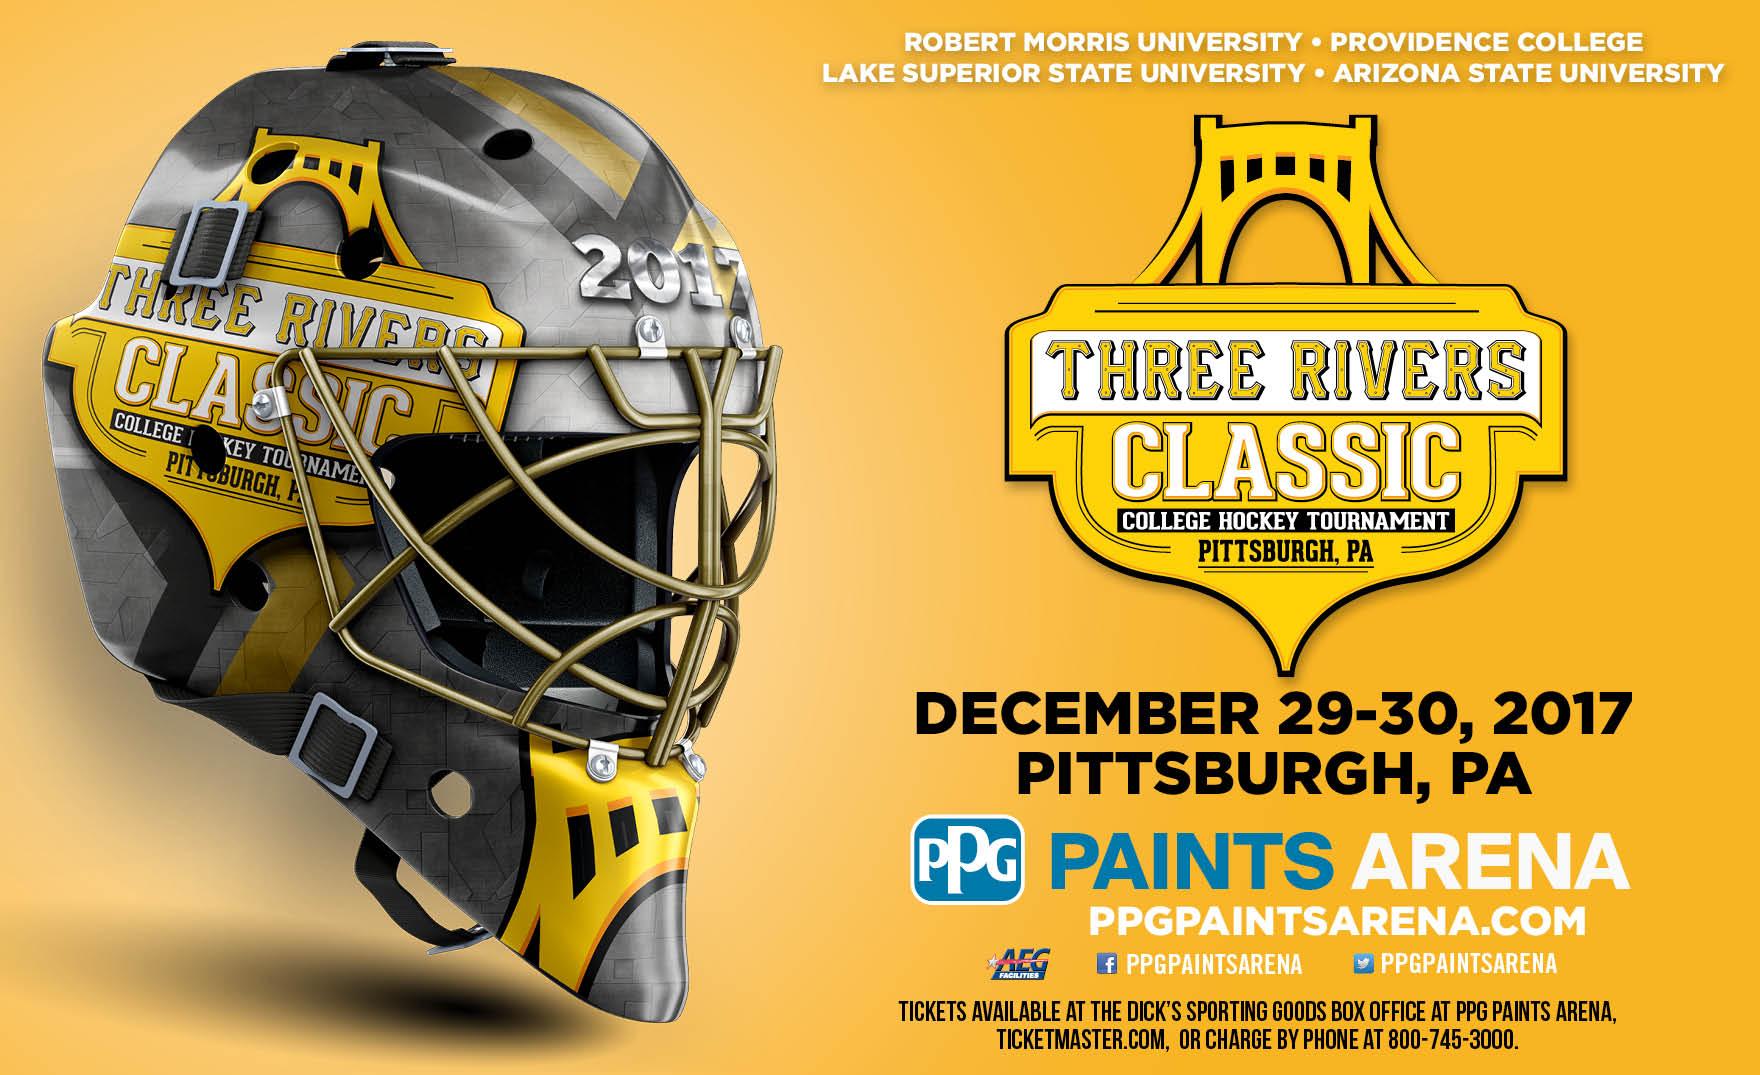 Three Rivers Classic: Men's College Hockey Tournament